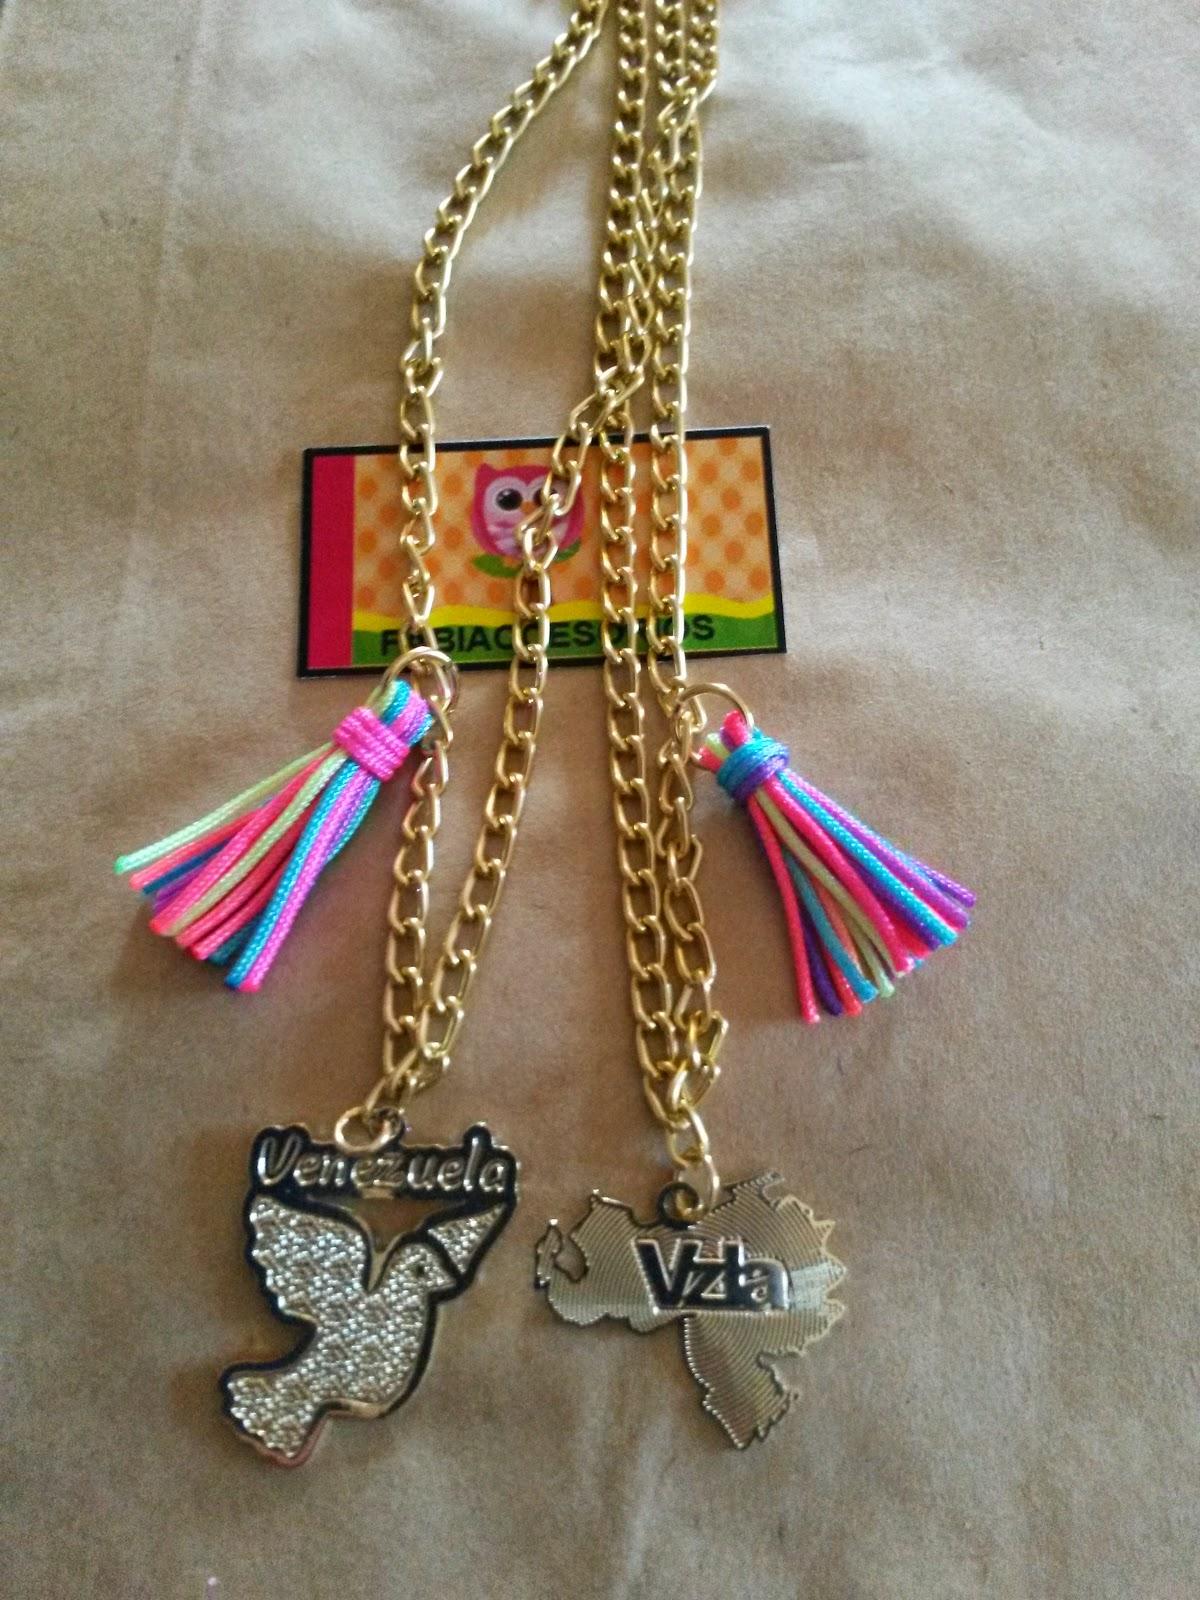 1669e2931c69 Hermosos collares representativos de nuestro pais Venezuela